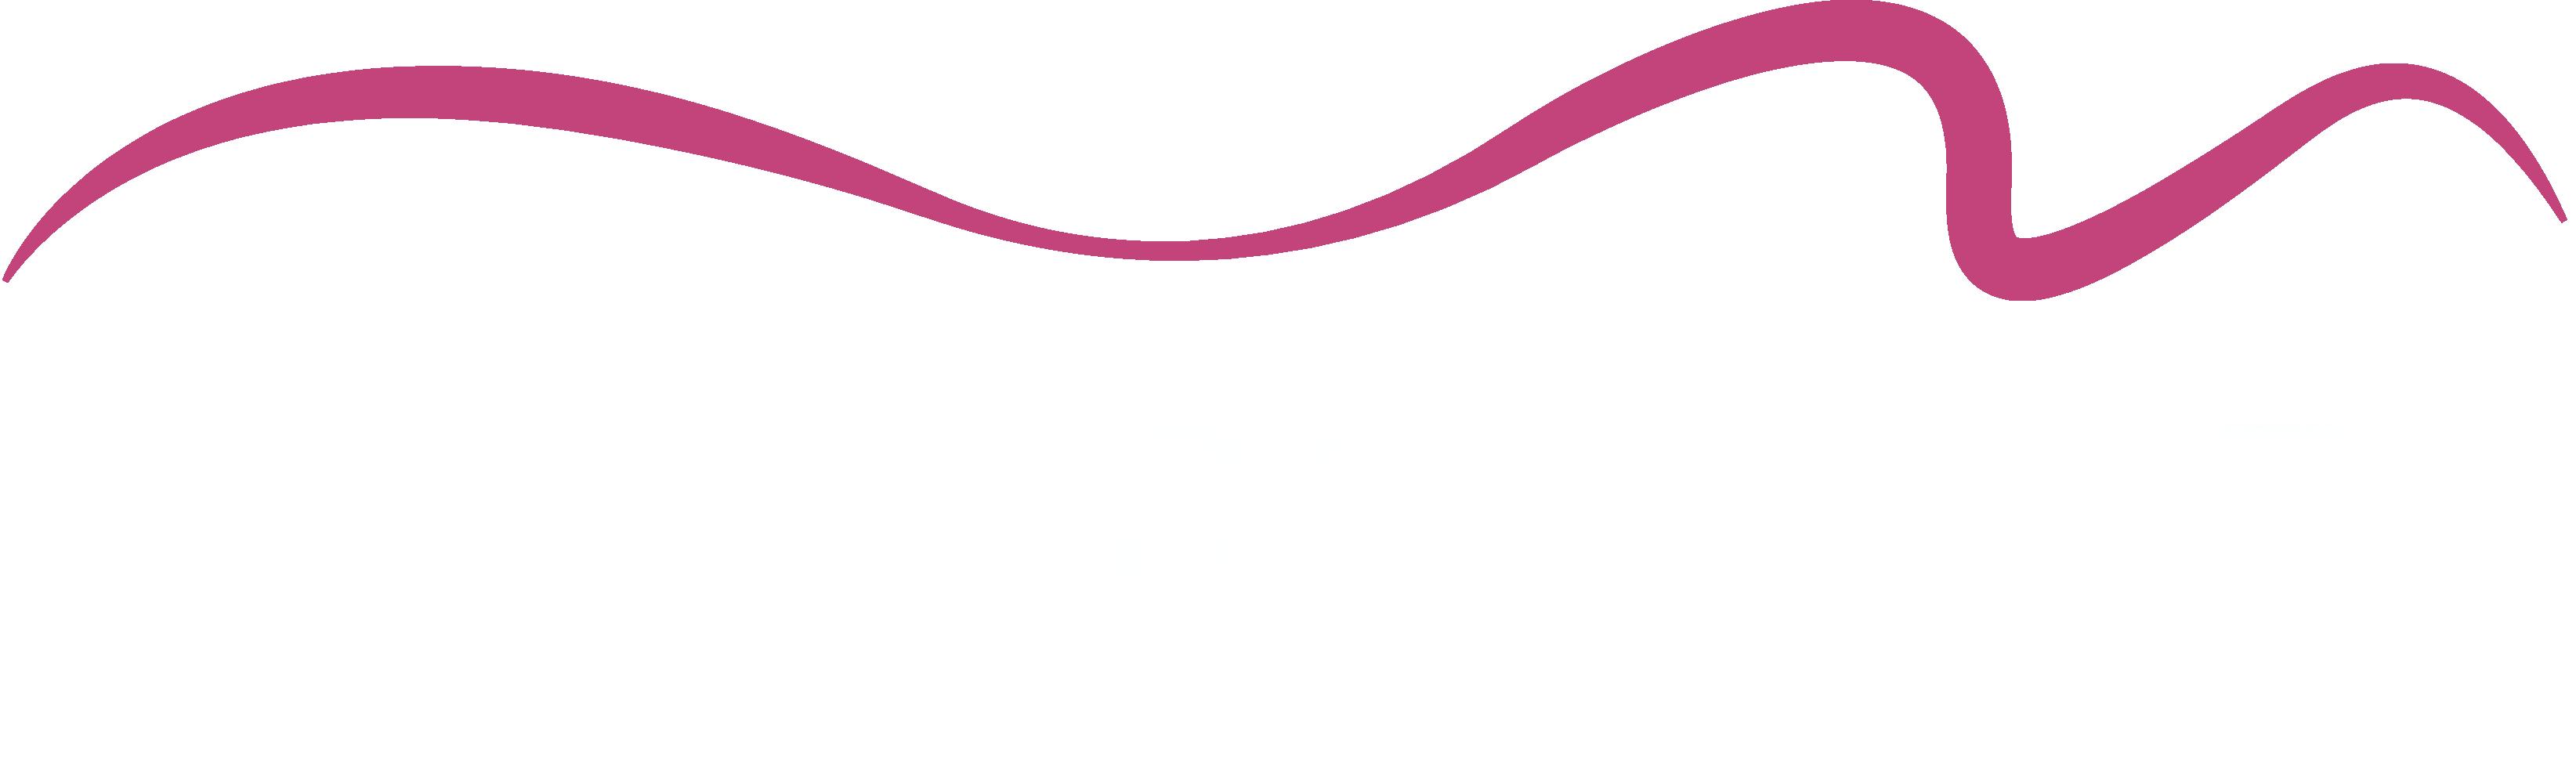 Массаж Ирпень